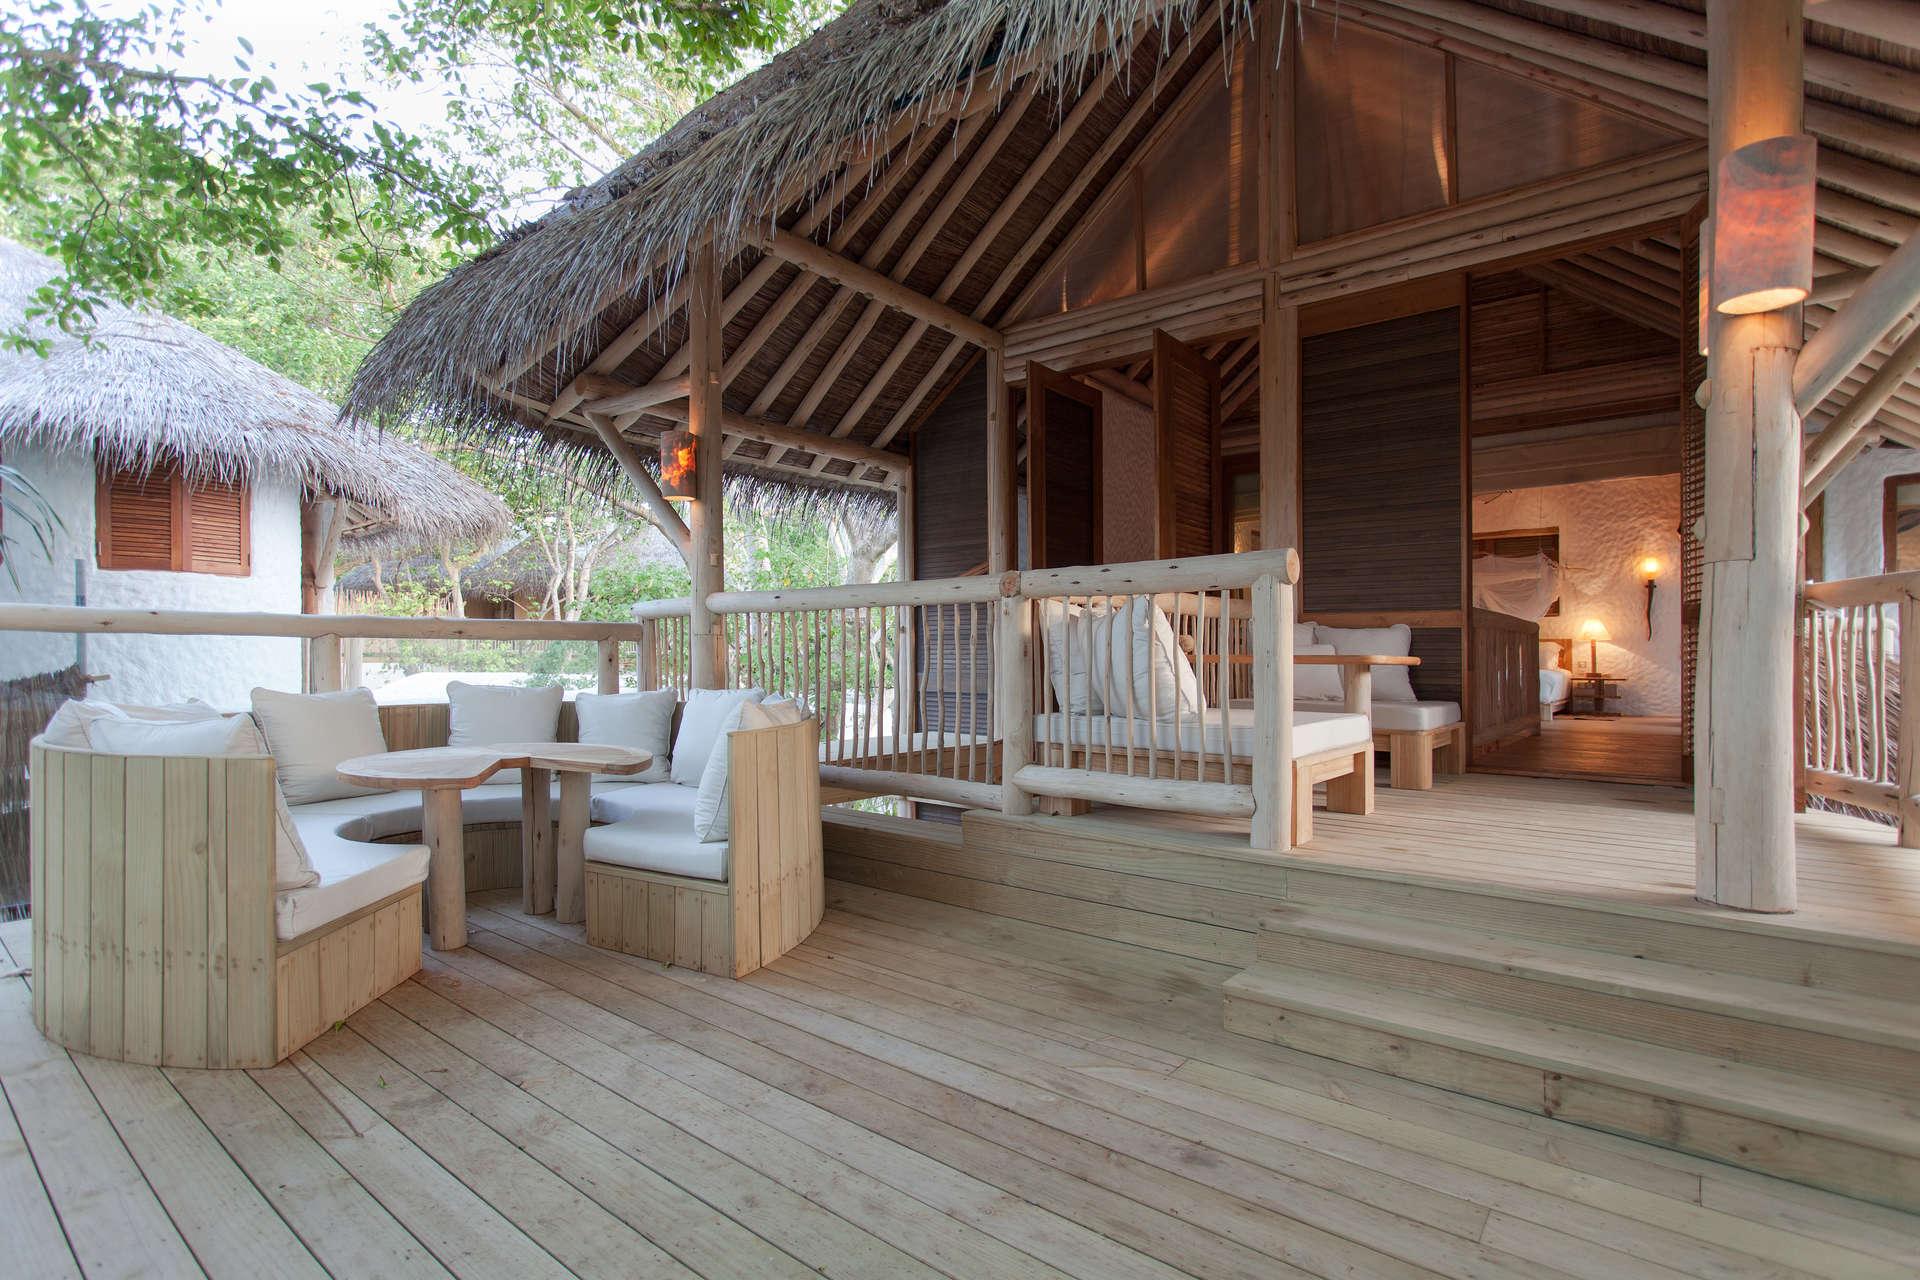 Luxury villa rentals asia - Maldives - Kunfunadhoo island - Soneva fushiresort - Crusoe Suite with Pool - Image 1/25